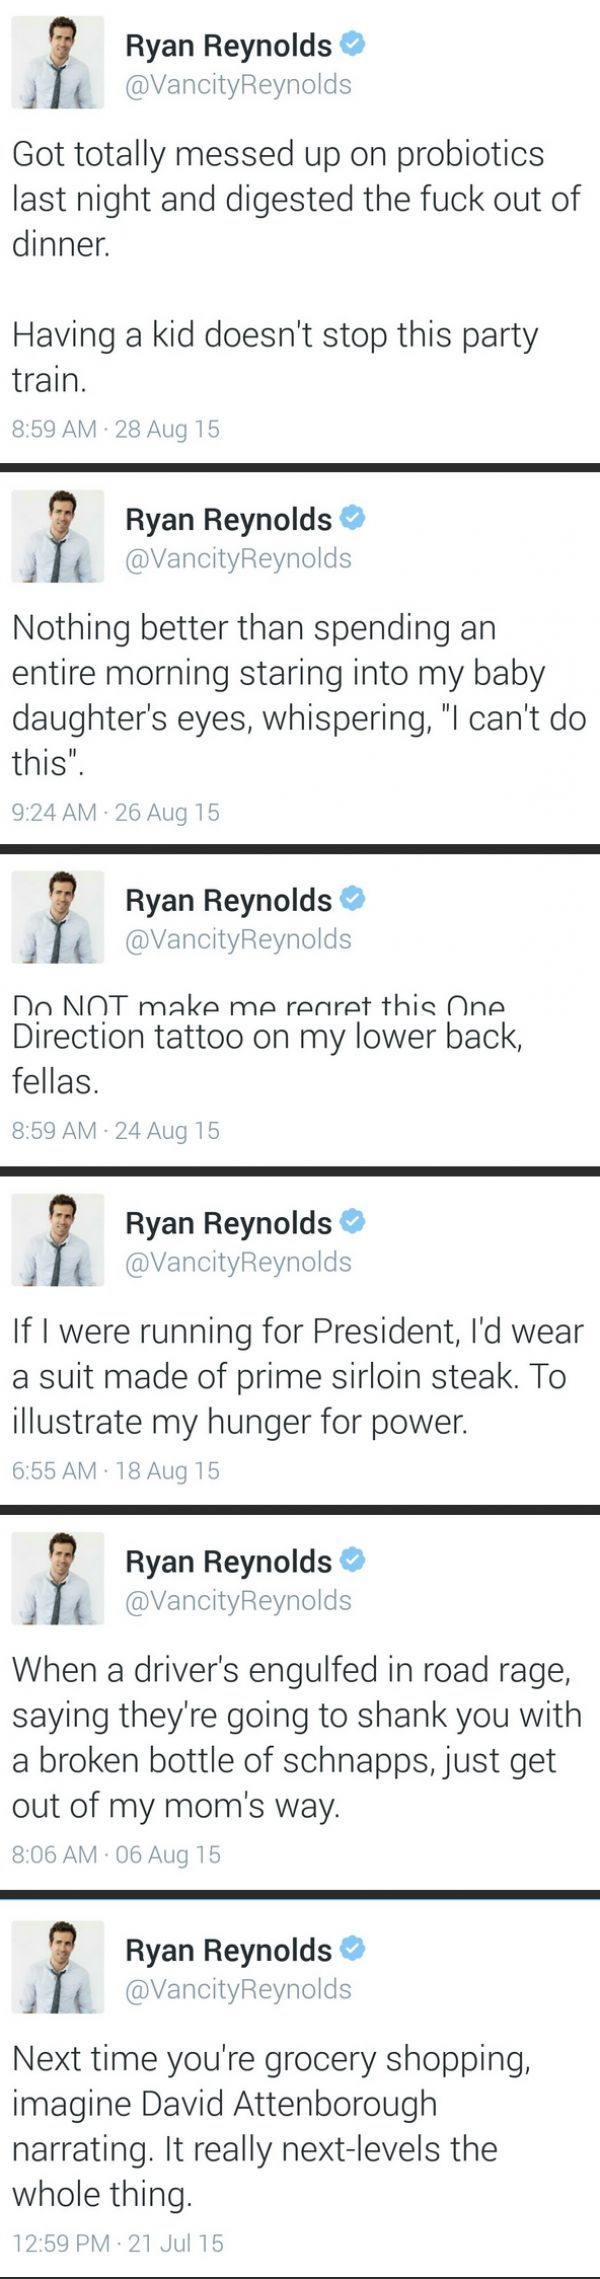 Ryan Reynolds Twitter is my new favorite thing